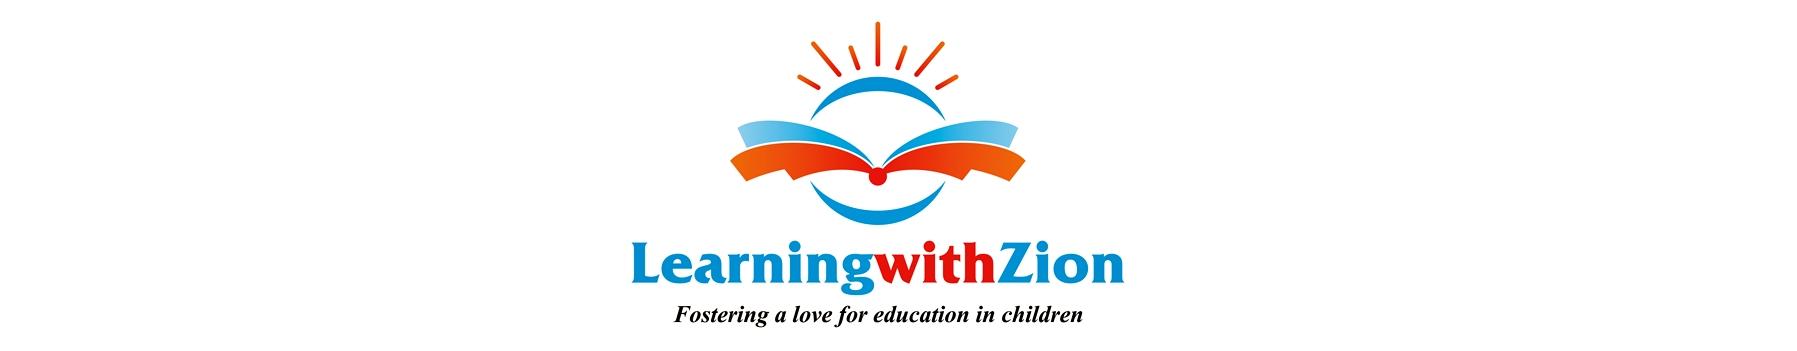 lwz_web_header_logo